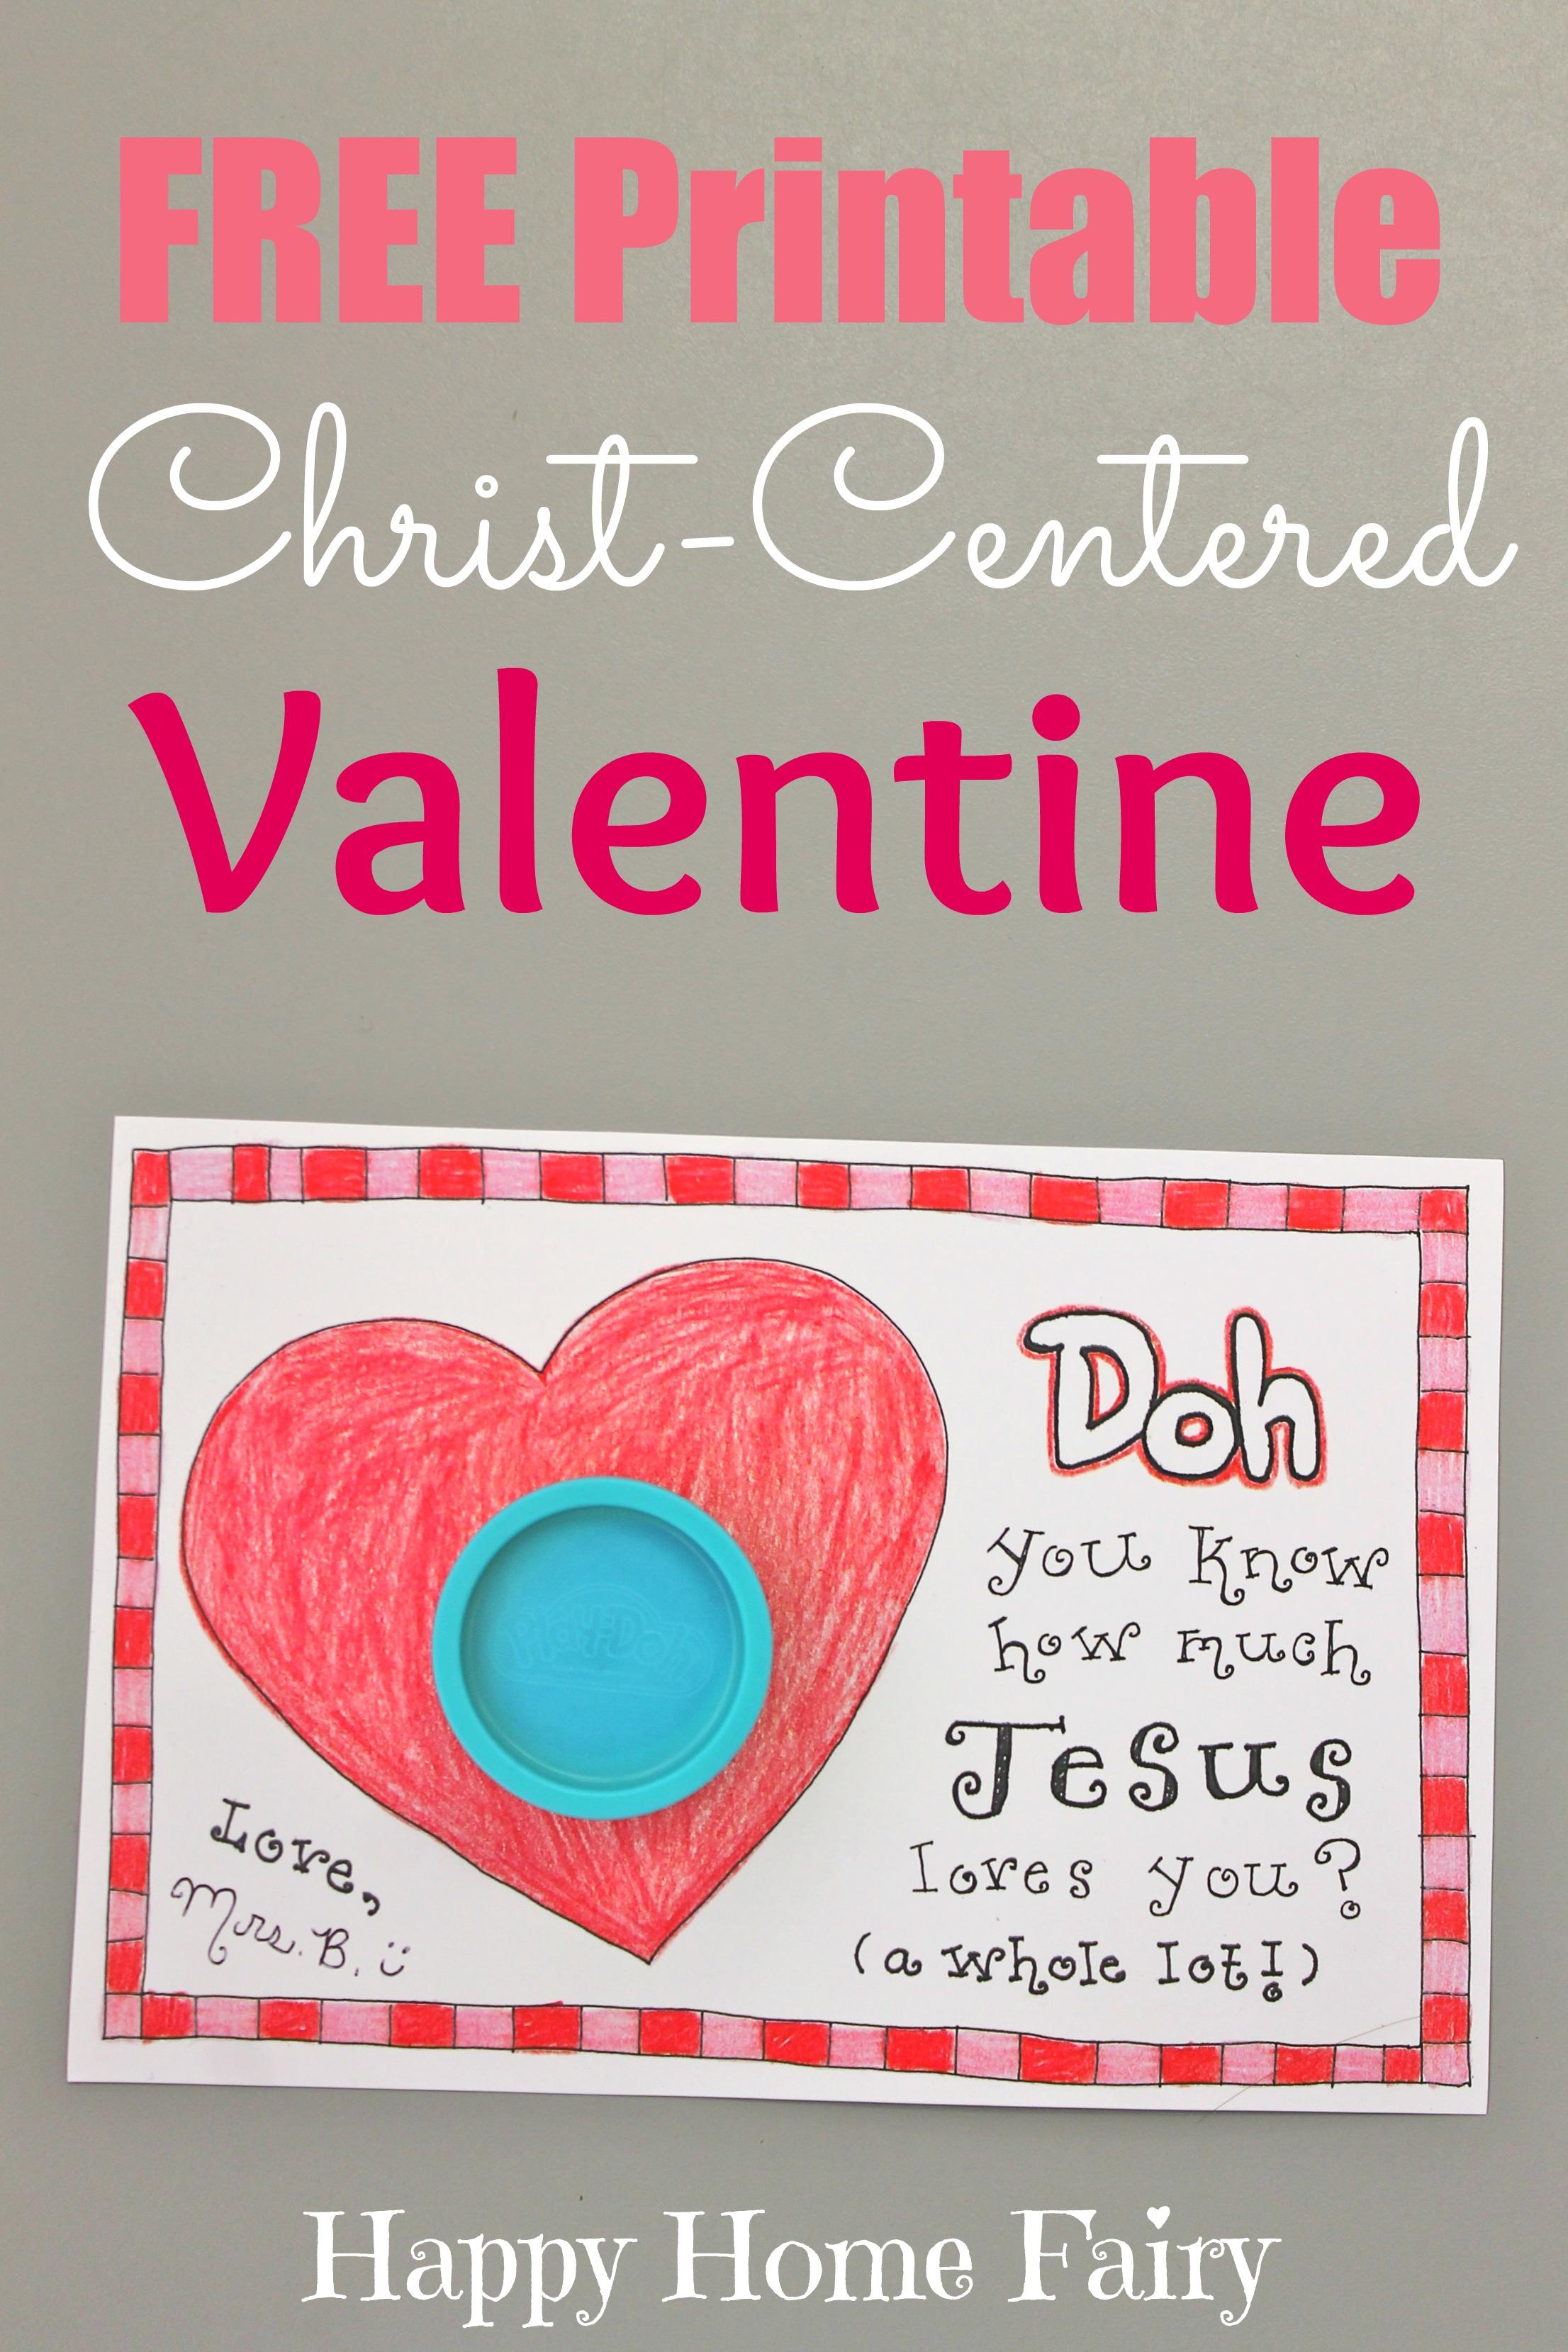 christ-centered valentine - free printable